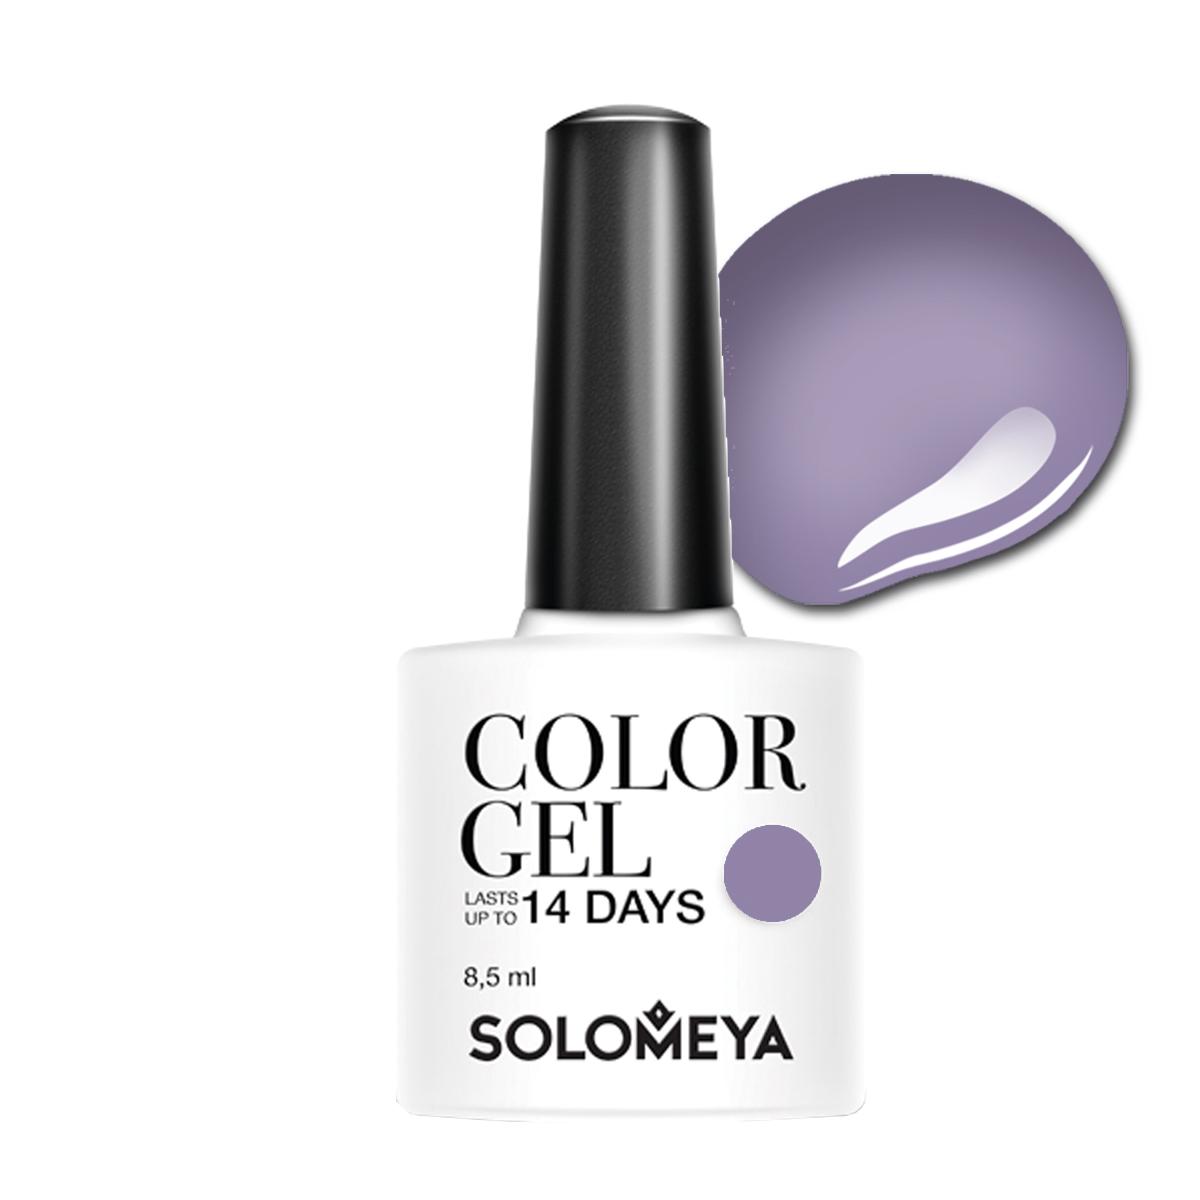 SOLOMEYA Гель-лак Solomeya Color Gel Wet Stone SCG002/Мокрый камень 8,5 мл